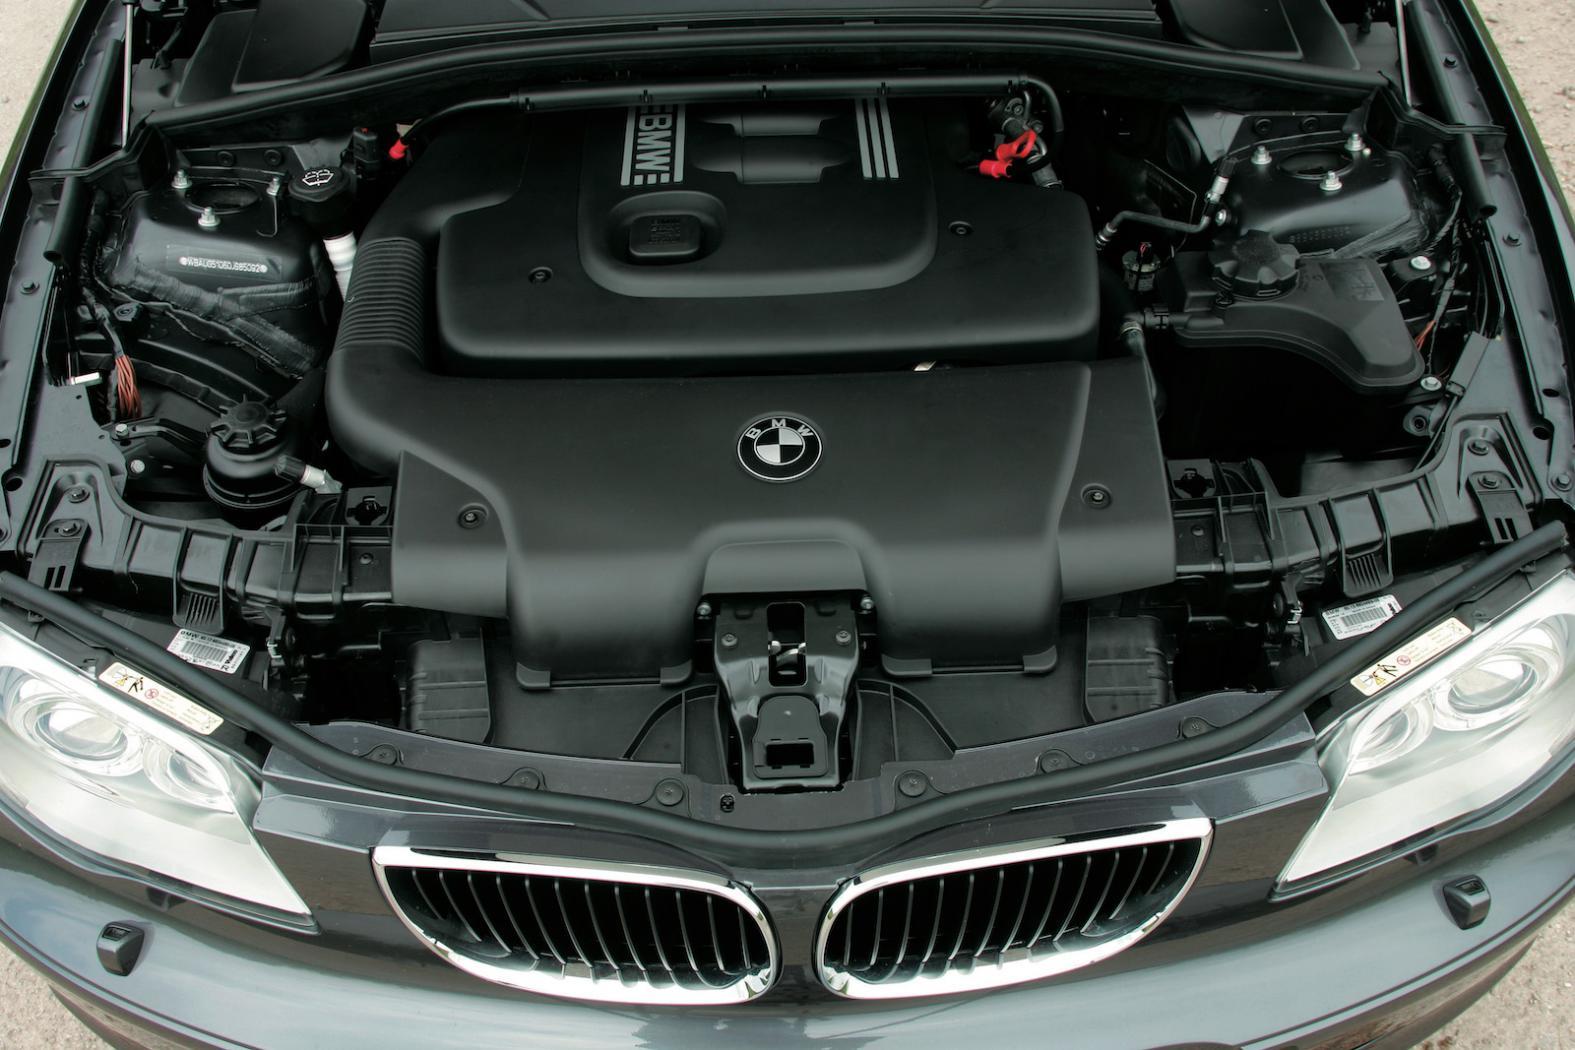 BMW-Serie1-E87-Casse-chaine-distribution-3.jpeg